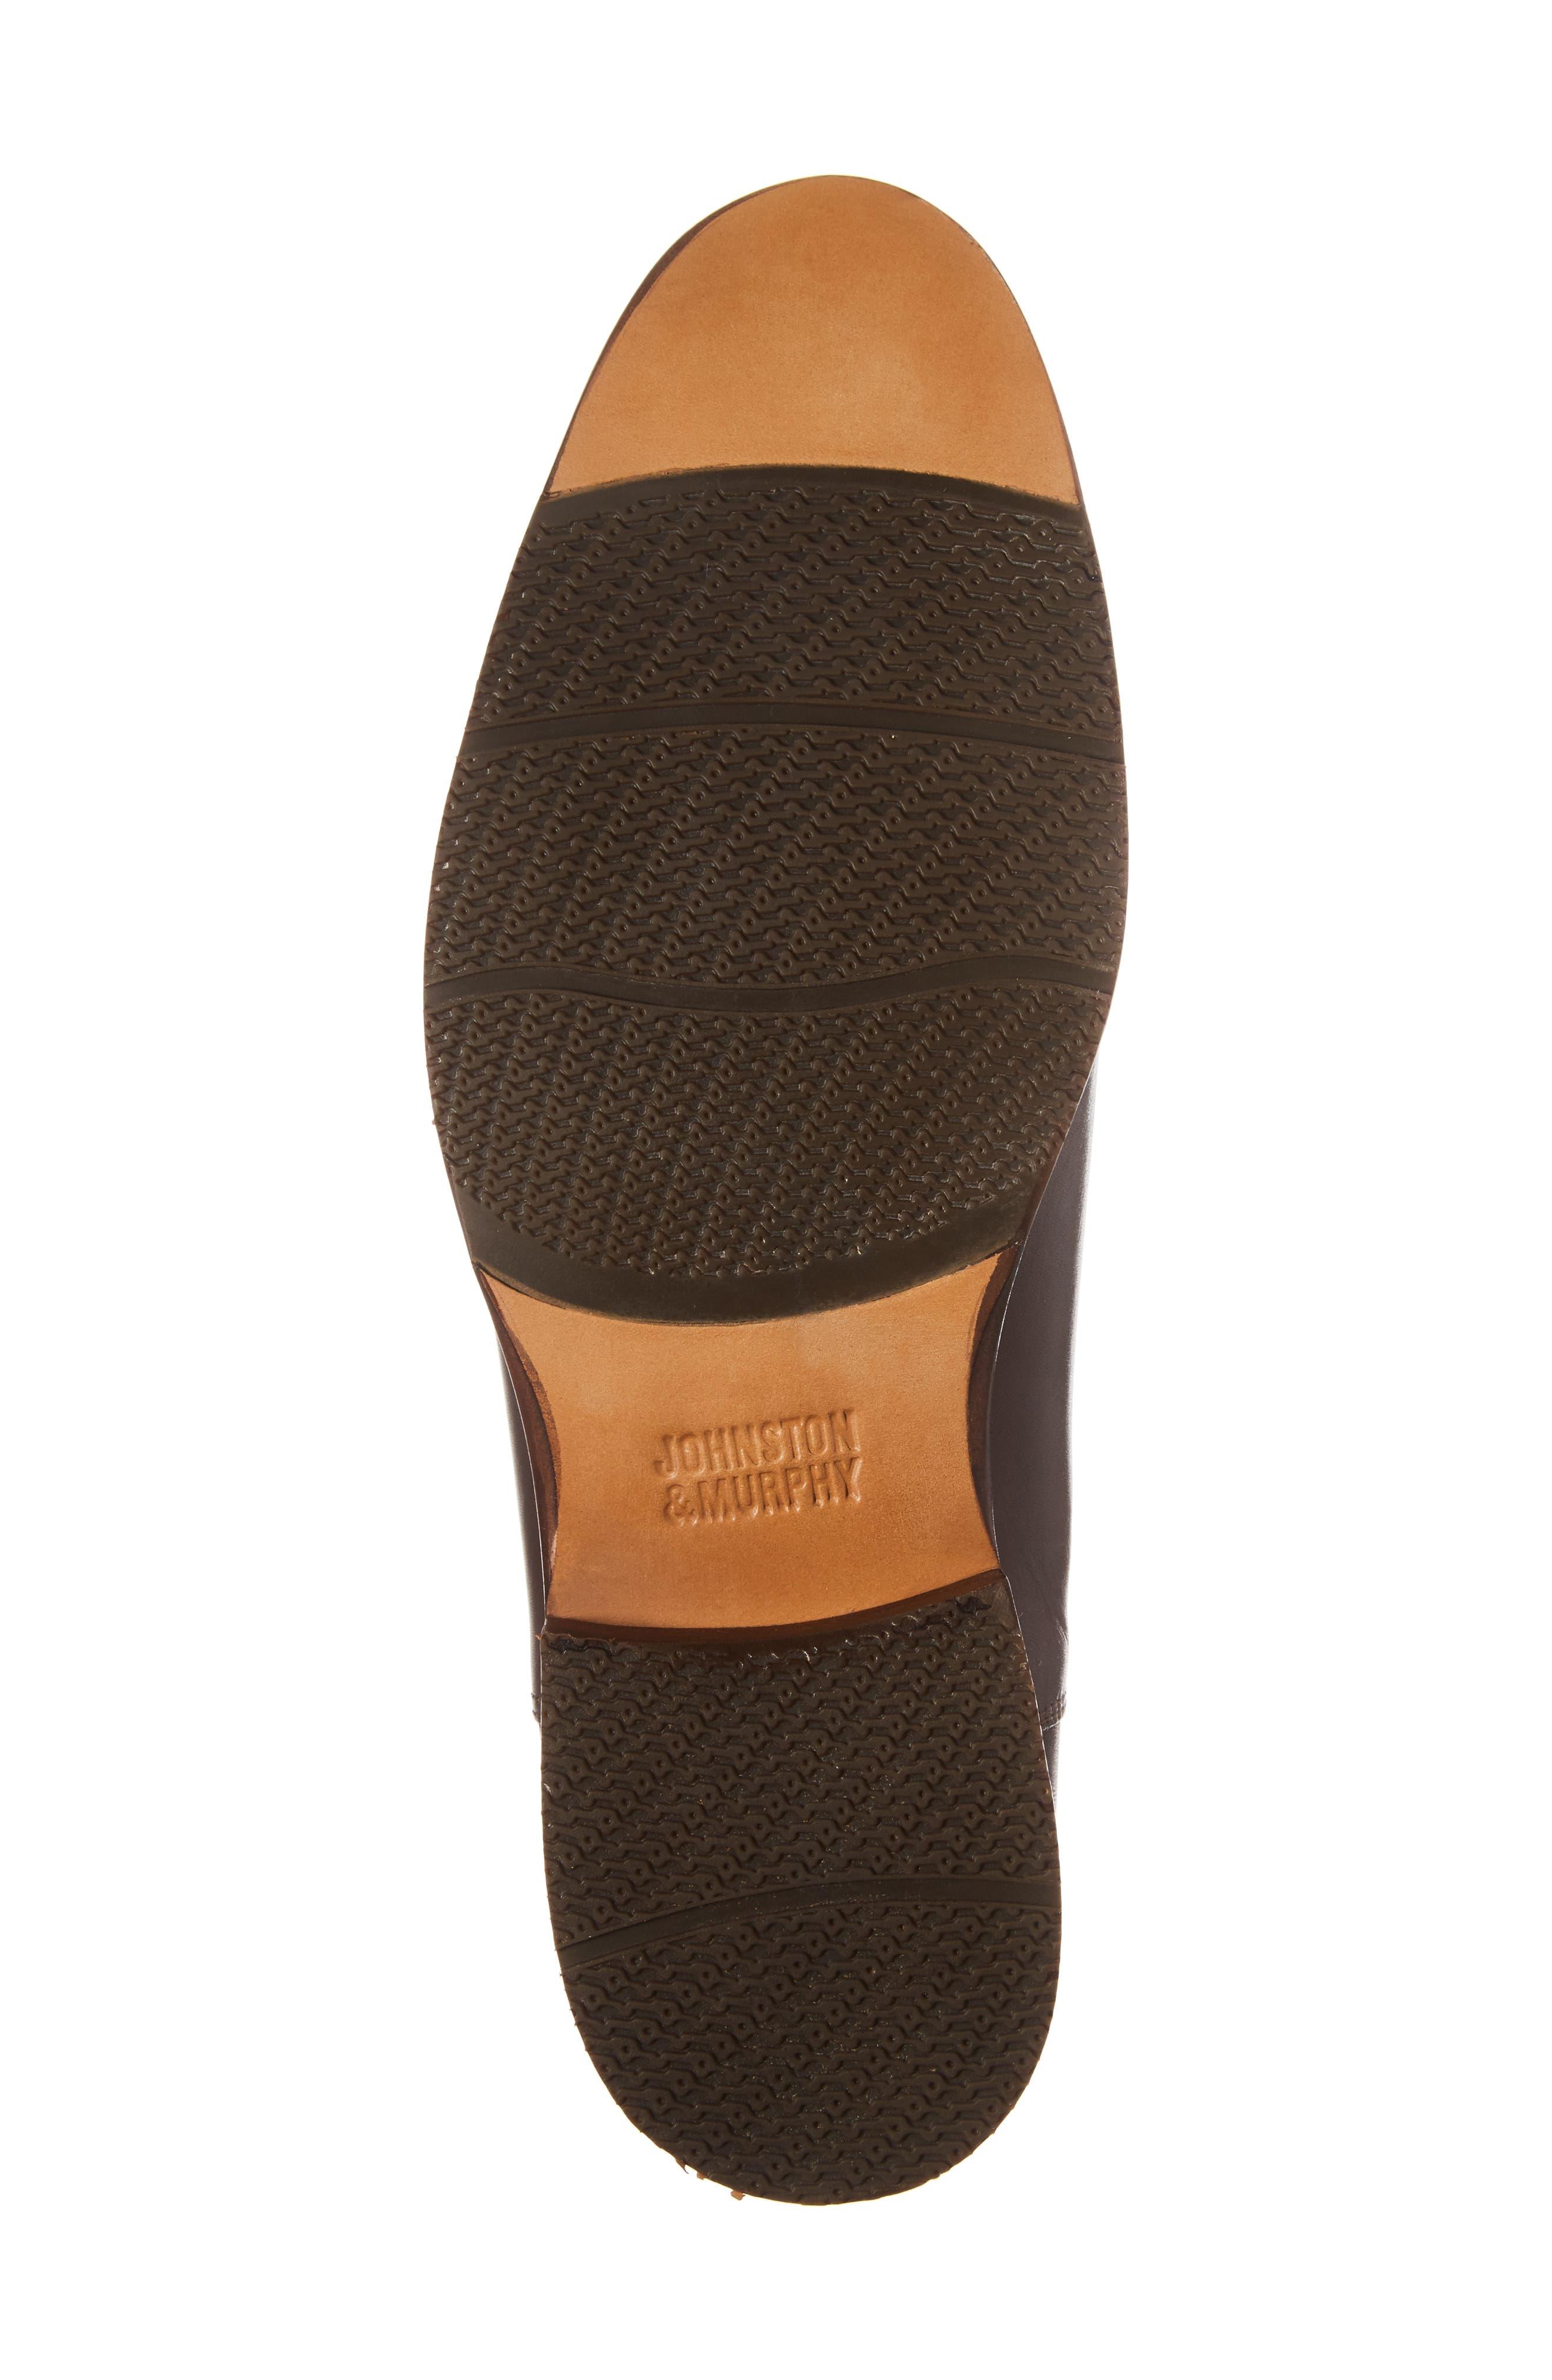 Garner Chelsea Boot,                             Alternate thumbnail 6, color,                             Mahogany Leather